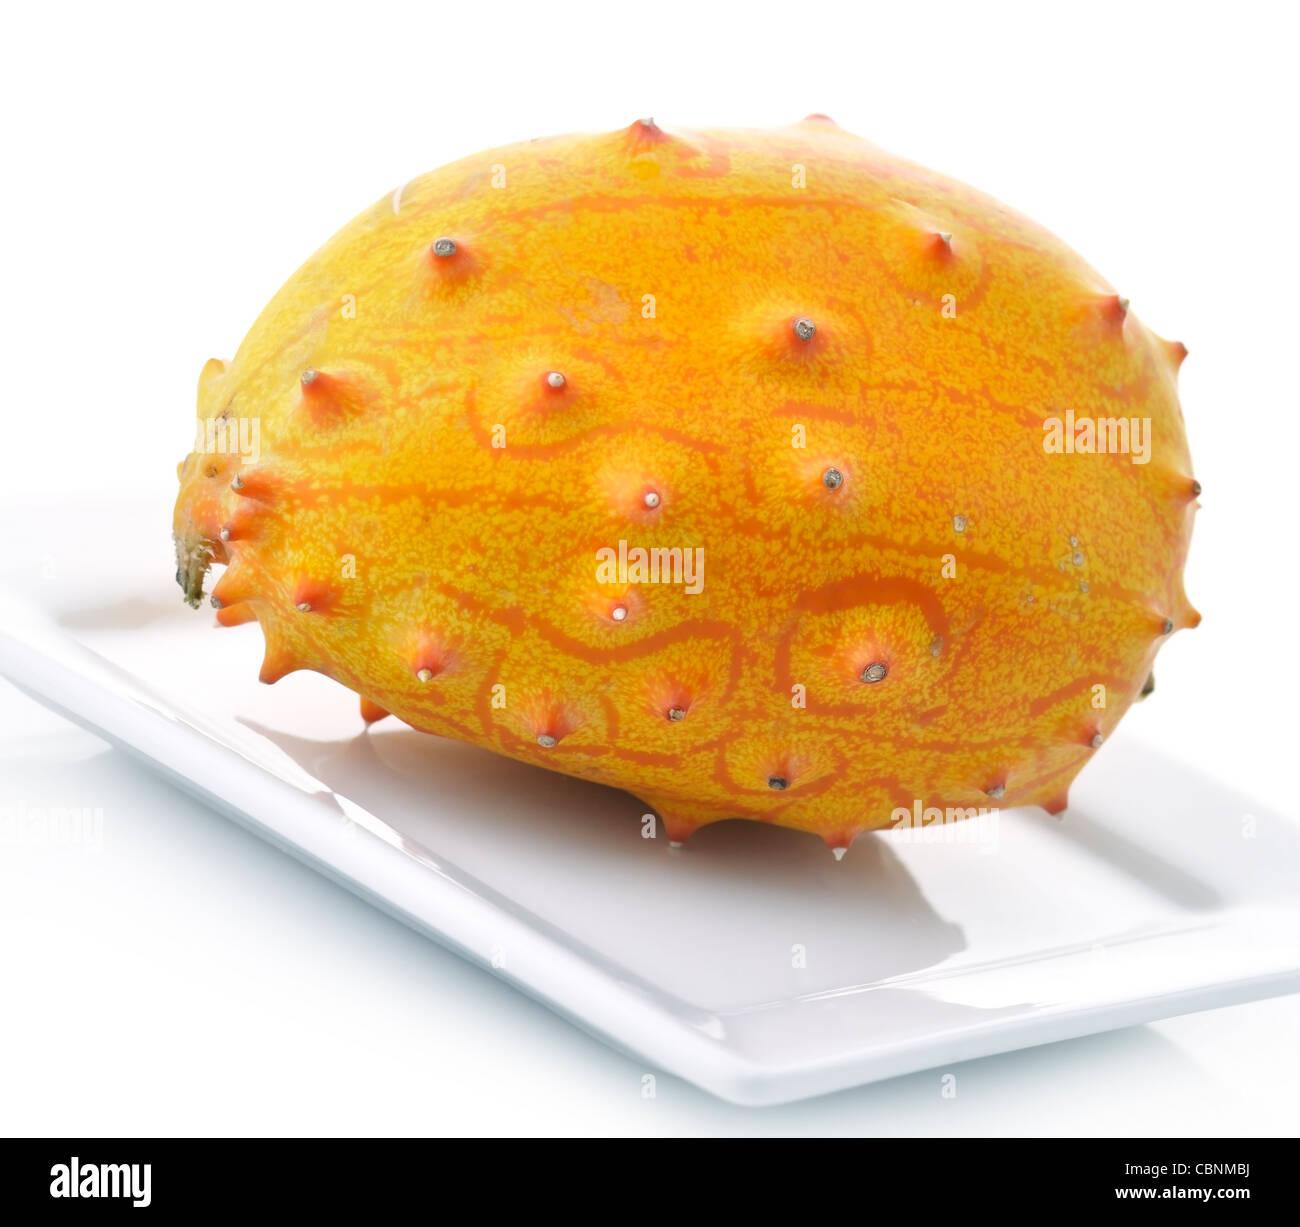 Kiwano Melon Tropical Fruit On A White Plate - Stock Image